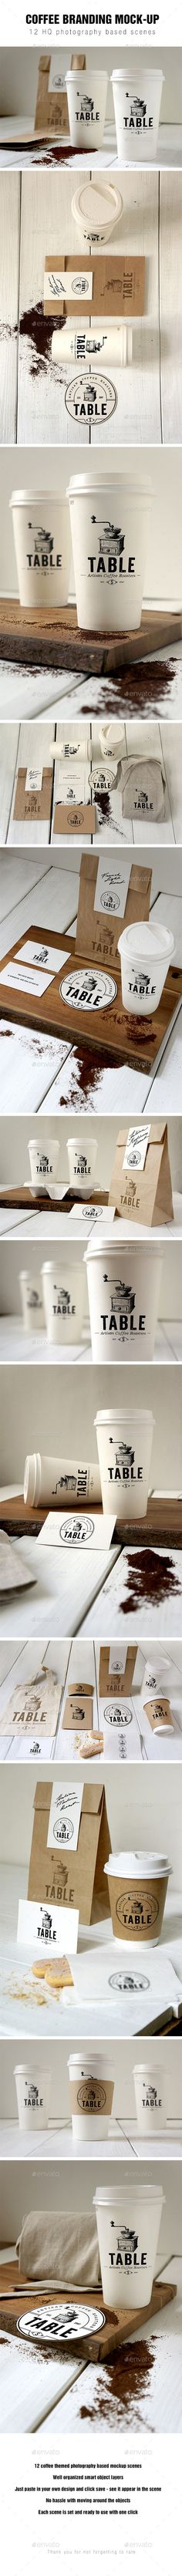 Coffee Branding Mockup #design Download: http://graphicriver.net/item/coffee-branding-mockup/12753492?ref=ksioks